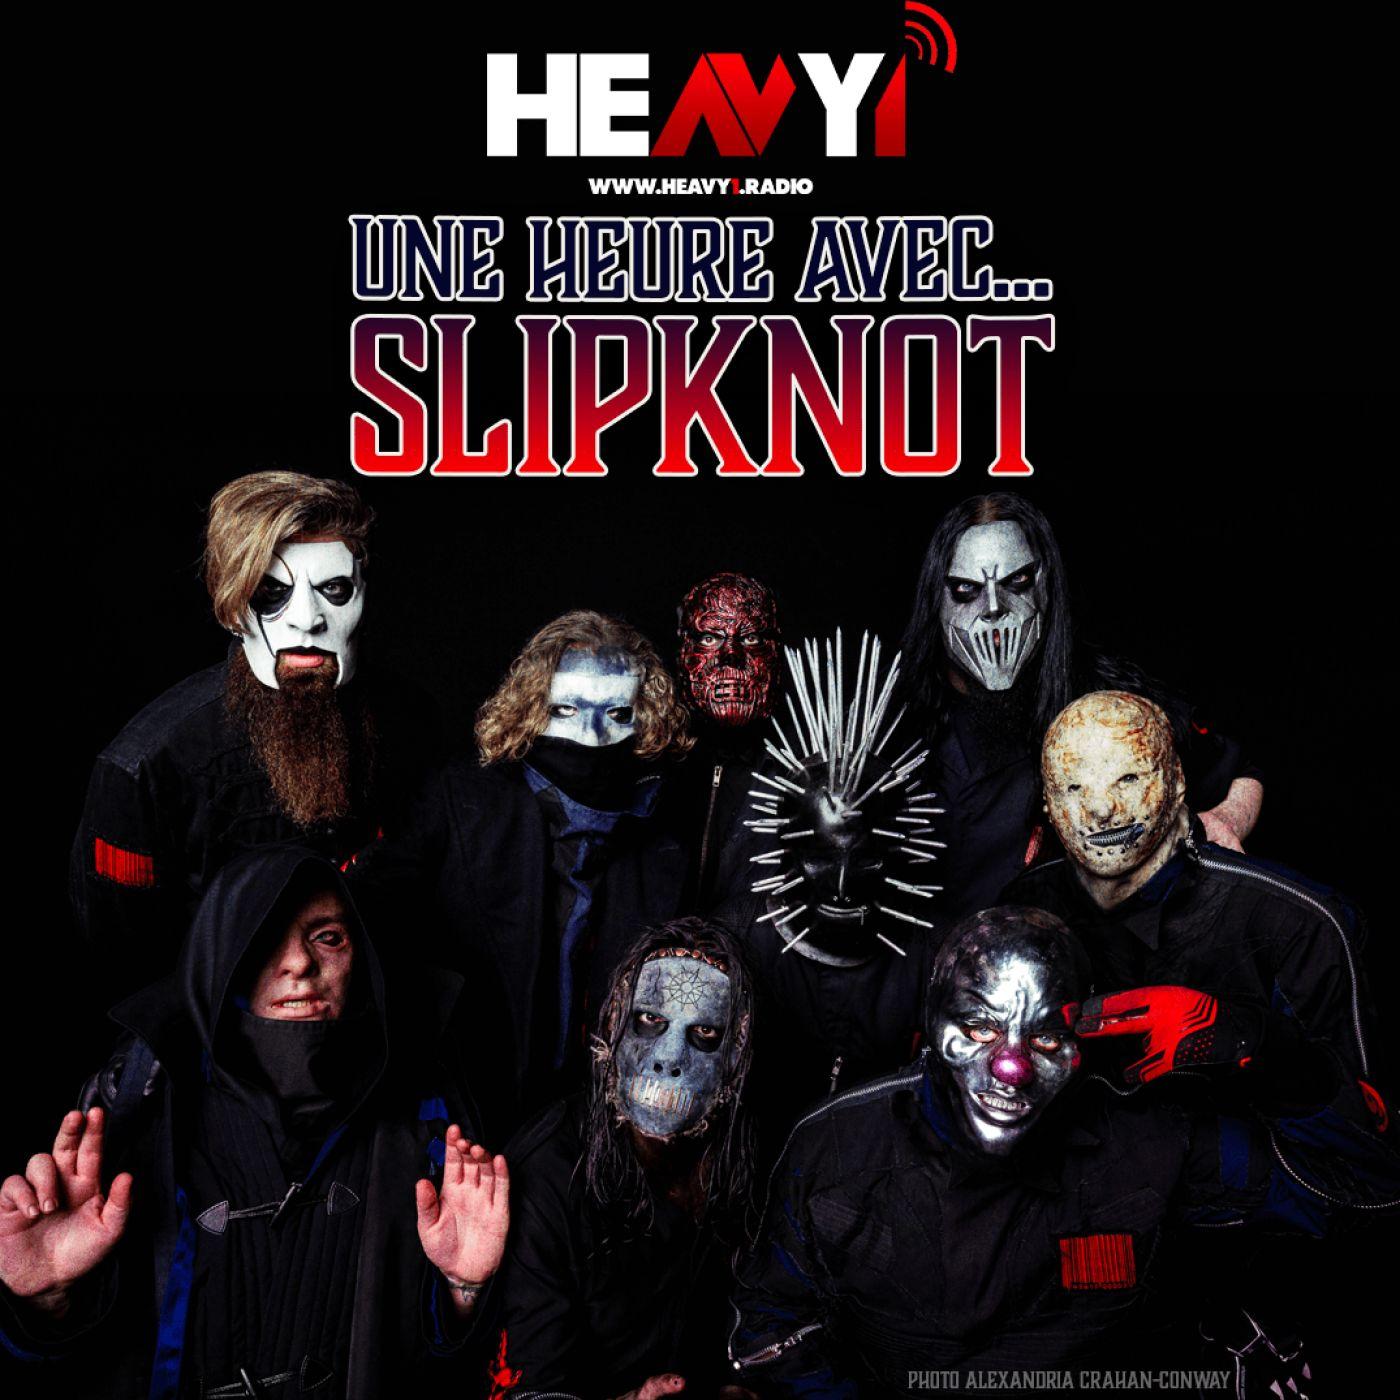 Une heure avec... Slipknot